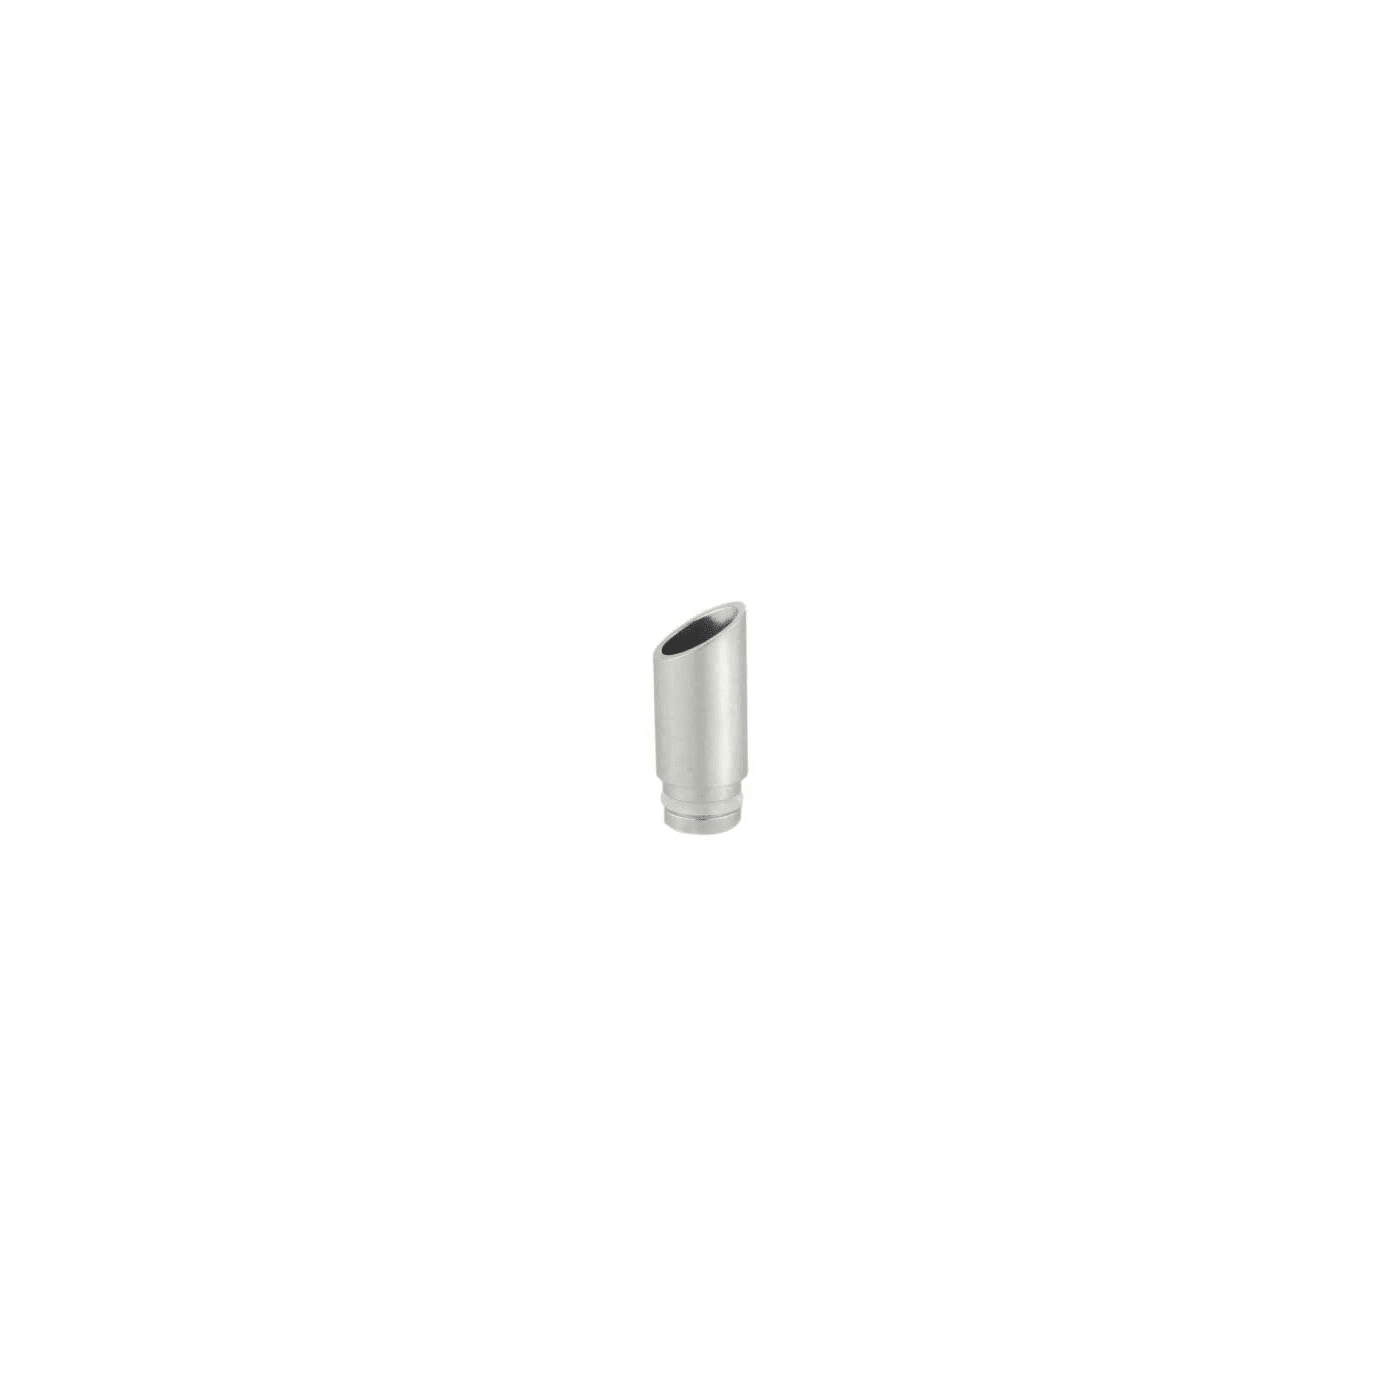 L-Cutting Drip Tip - Silver